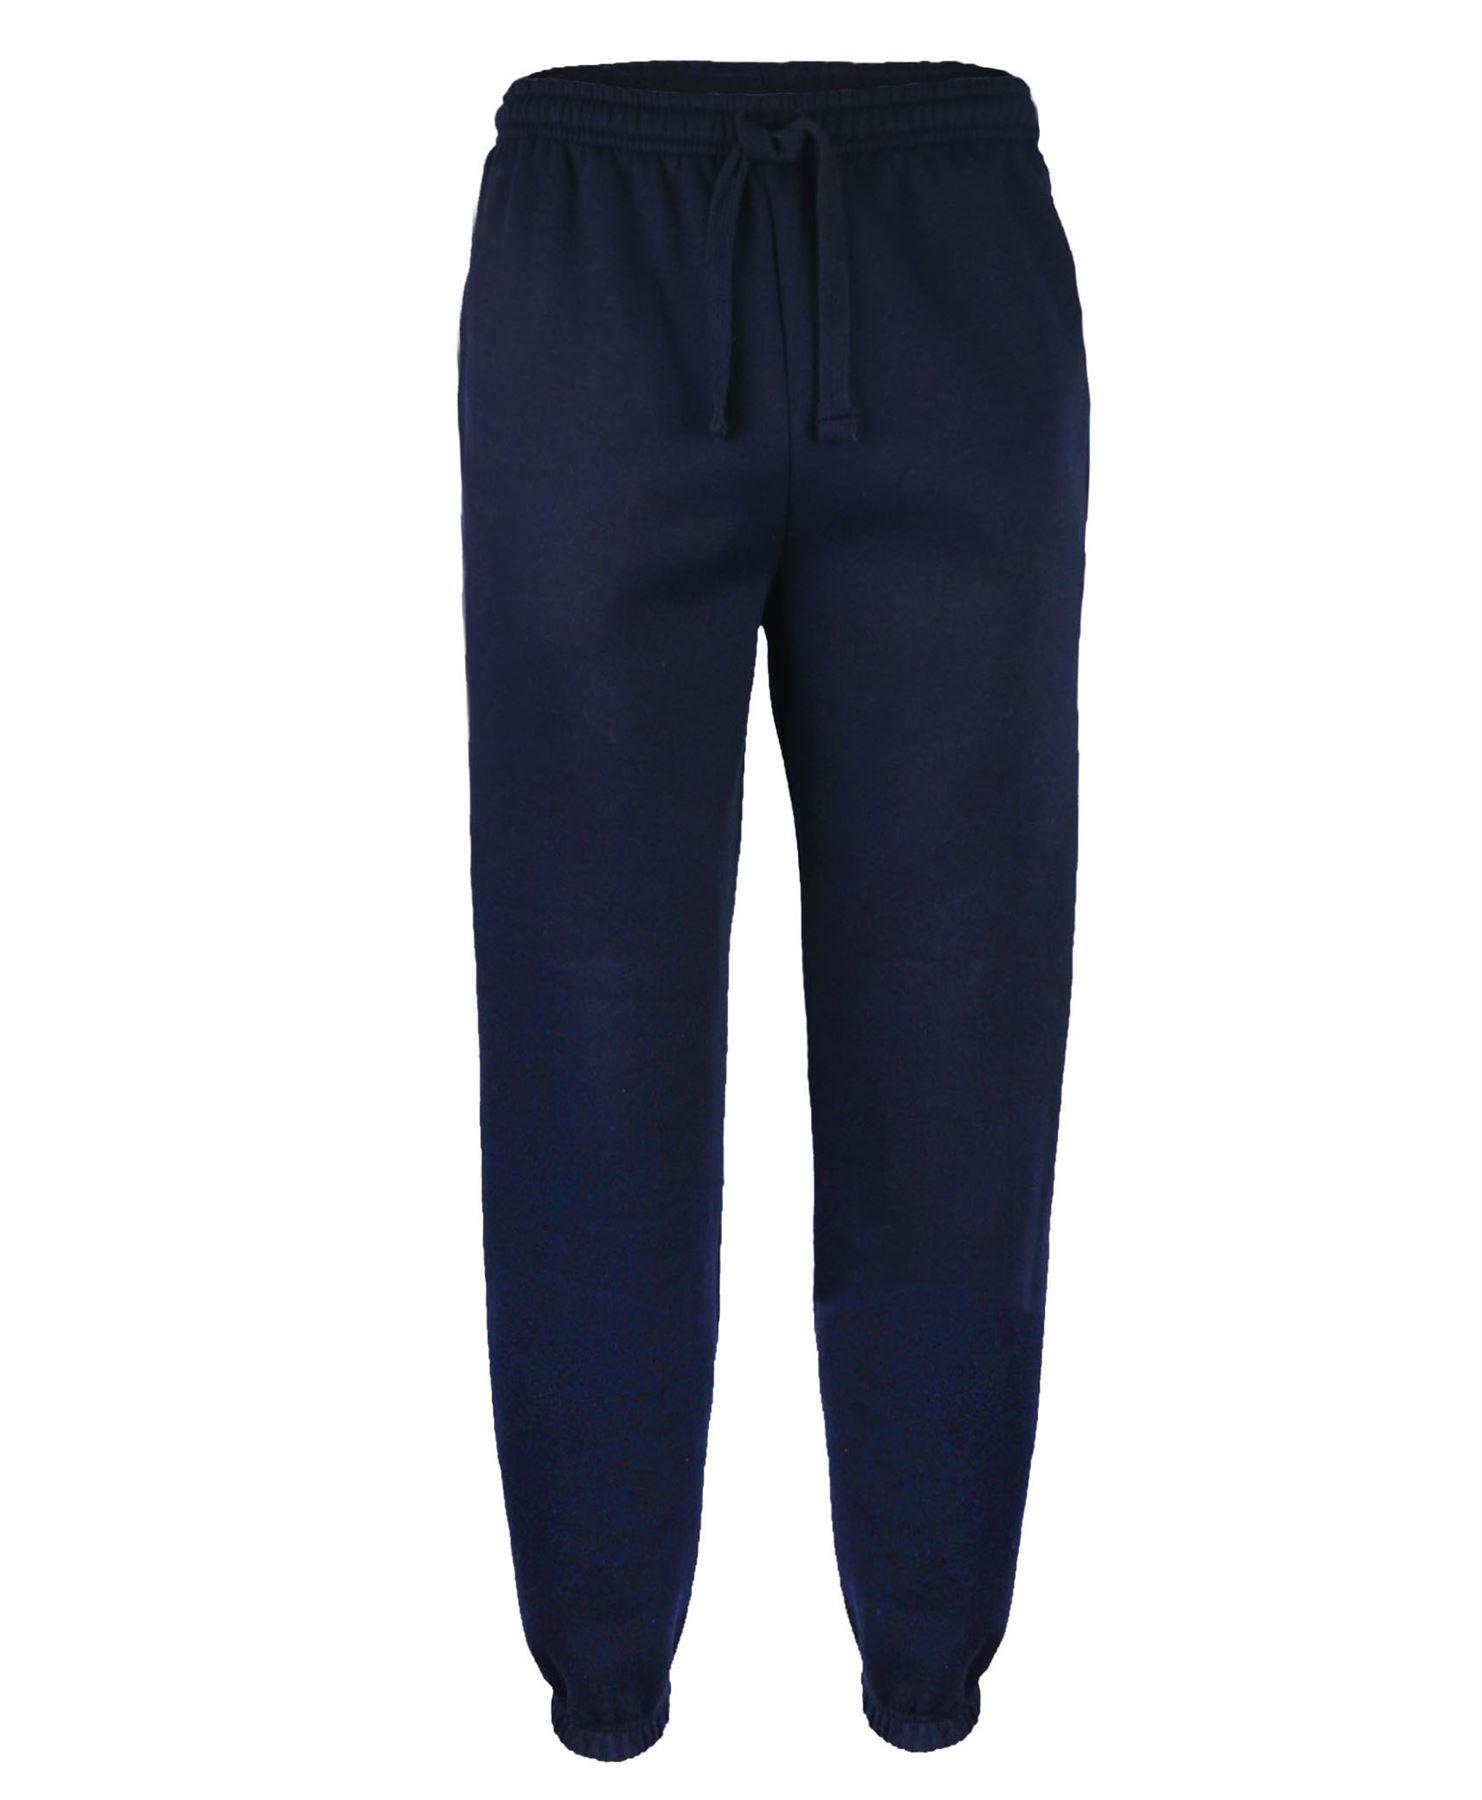 Men's Plain Front Pants - Shop Resort Wear & Island Clothing at Captain's Landing, offering fine men's fashions & accessories since Top brands include: Tori Richard, Kahala, Brighton, Hook & .